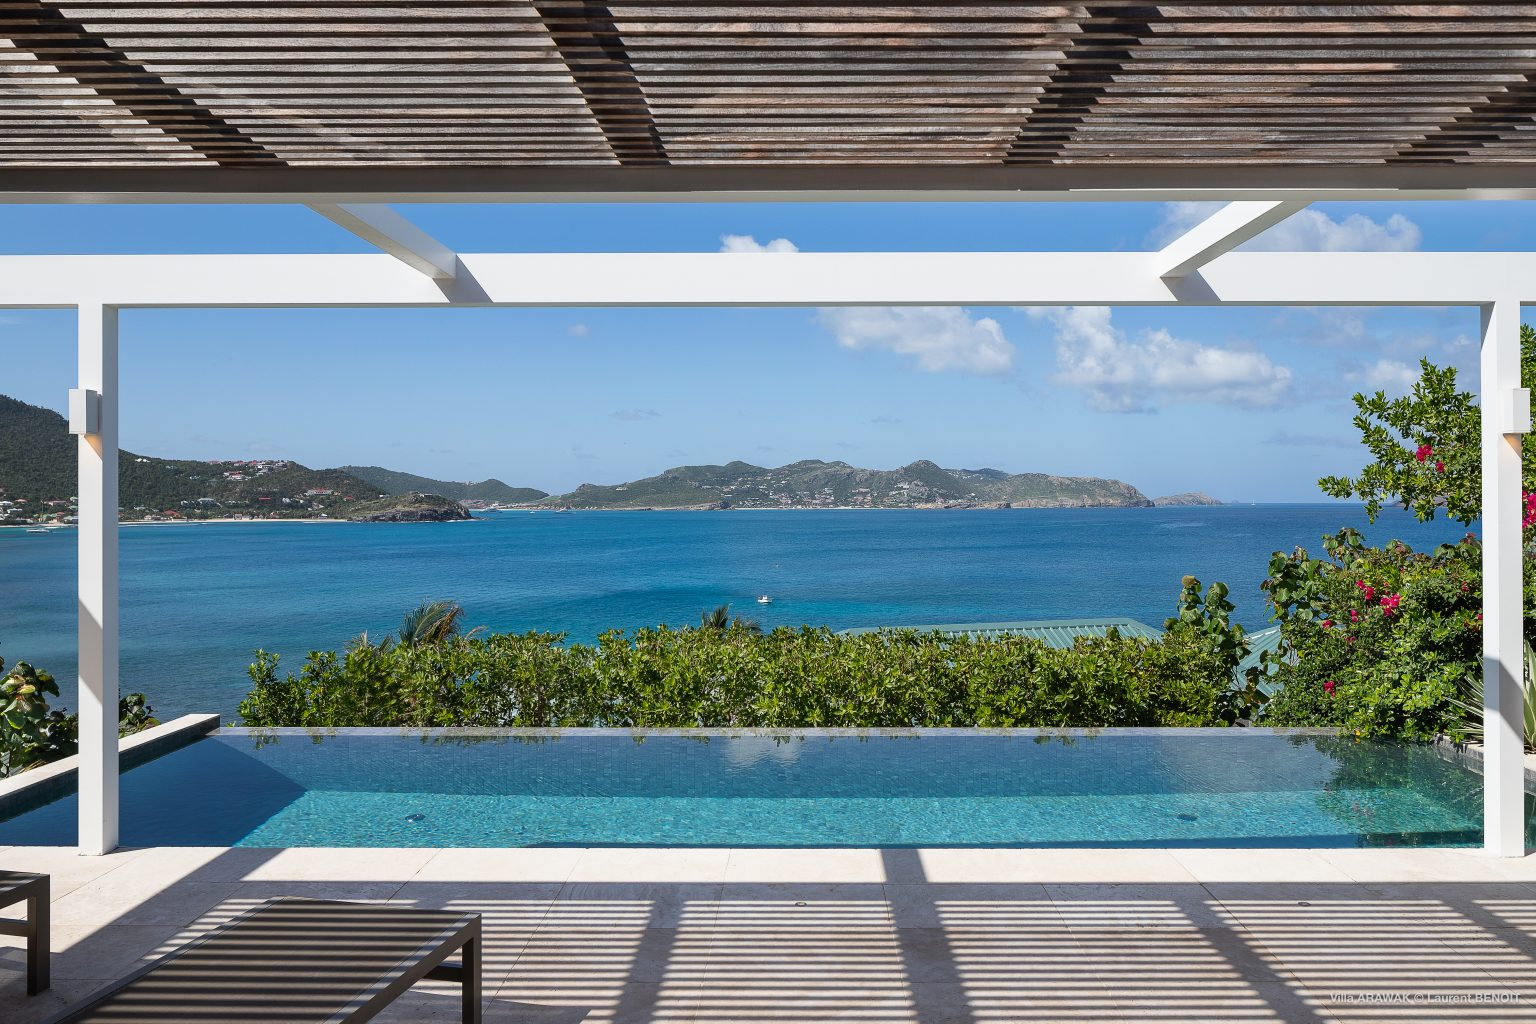 Villa Arawak - Modern and Elegant Villa for Rent St Barth Pointe Milou - Ocean View